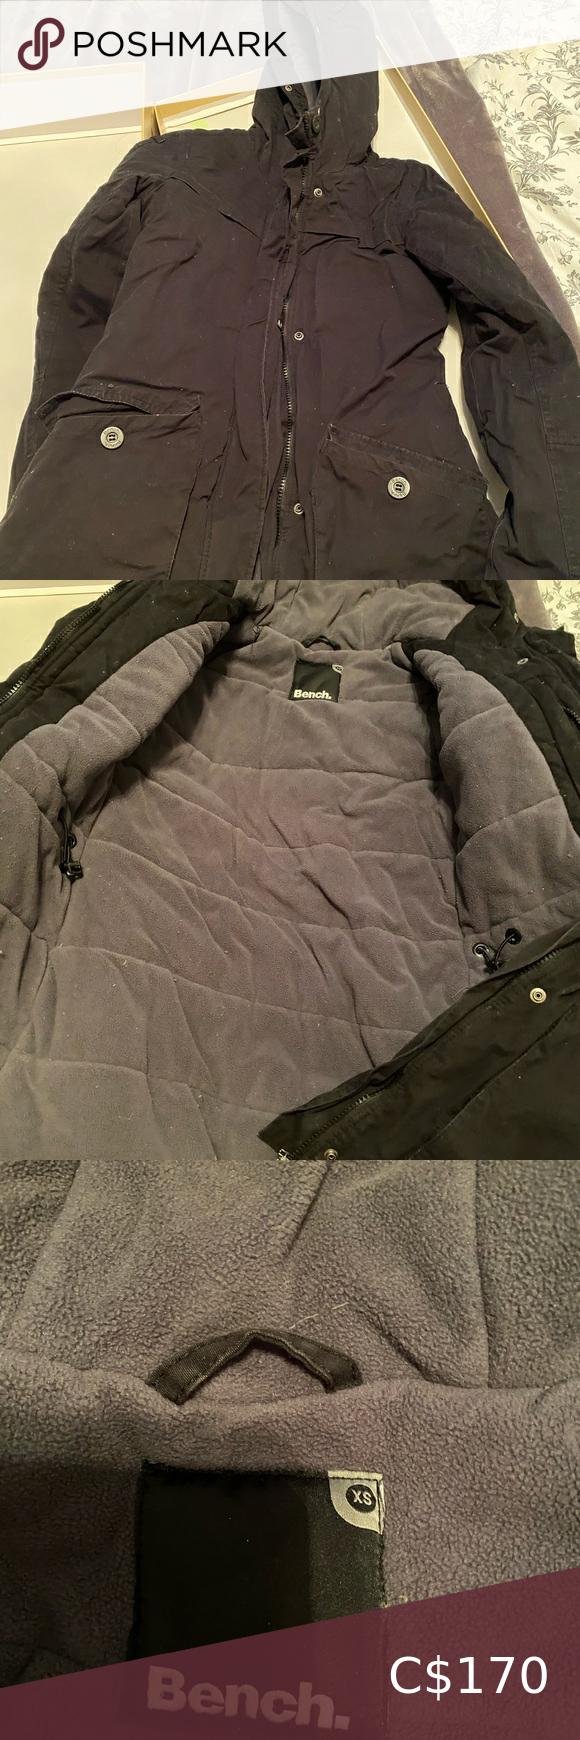 Bench Winter Coat Winter Coat Clothes Design Black Winter Coat [ 1740 x 580 Pixel ]